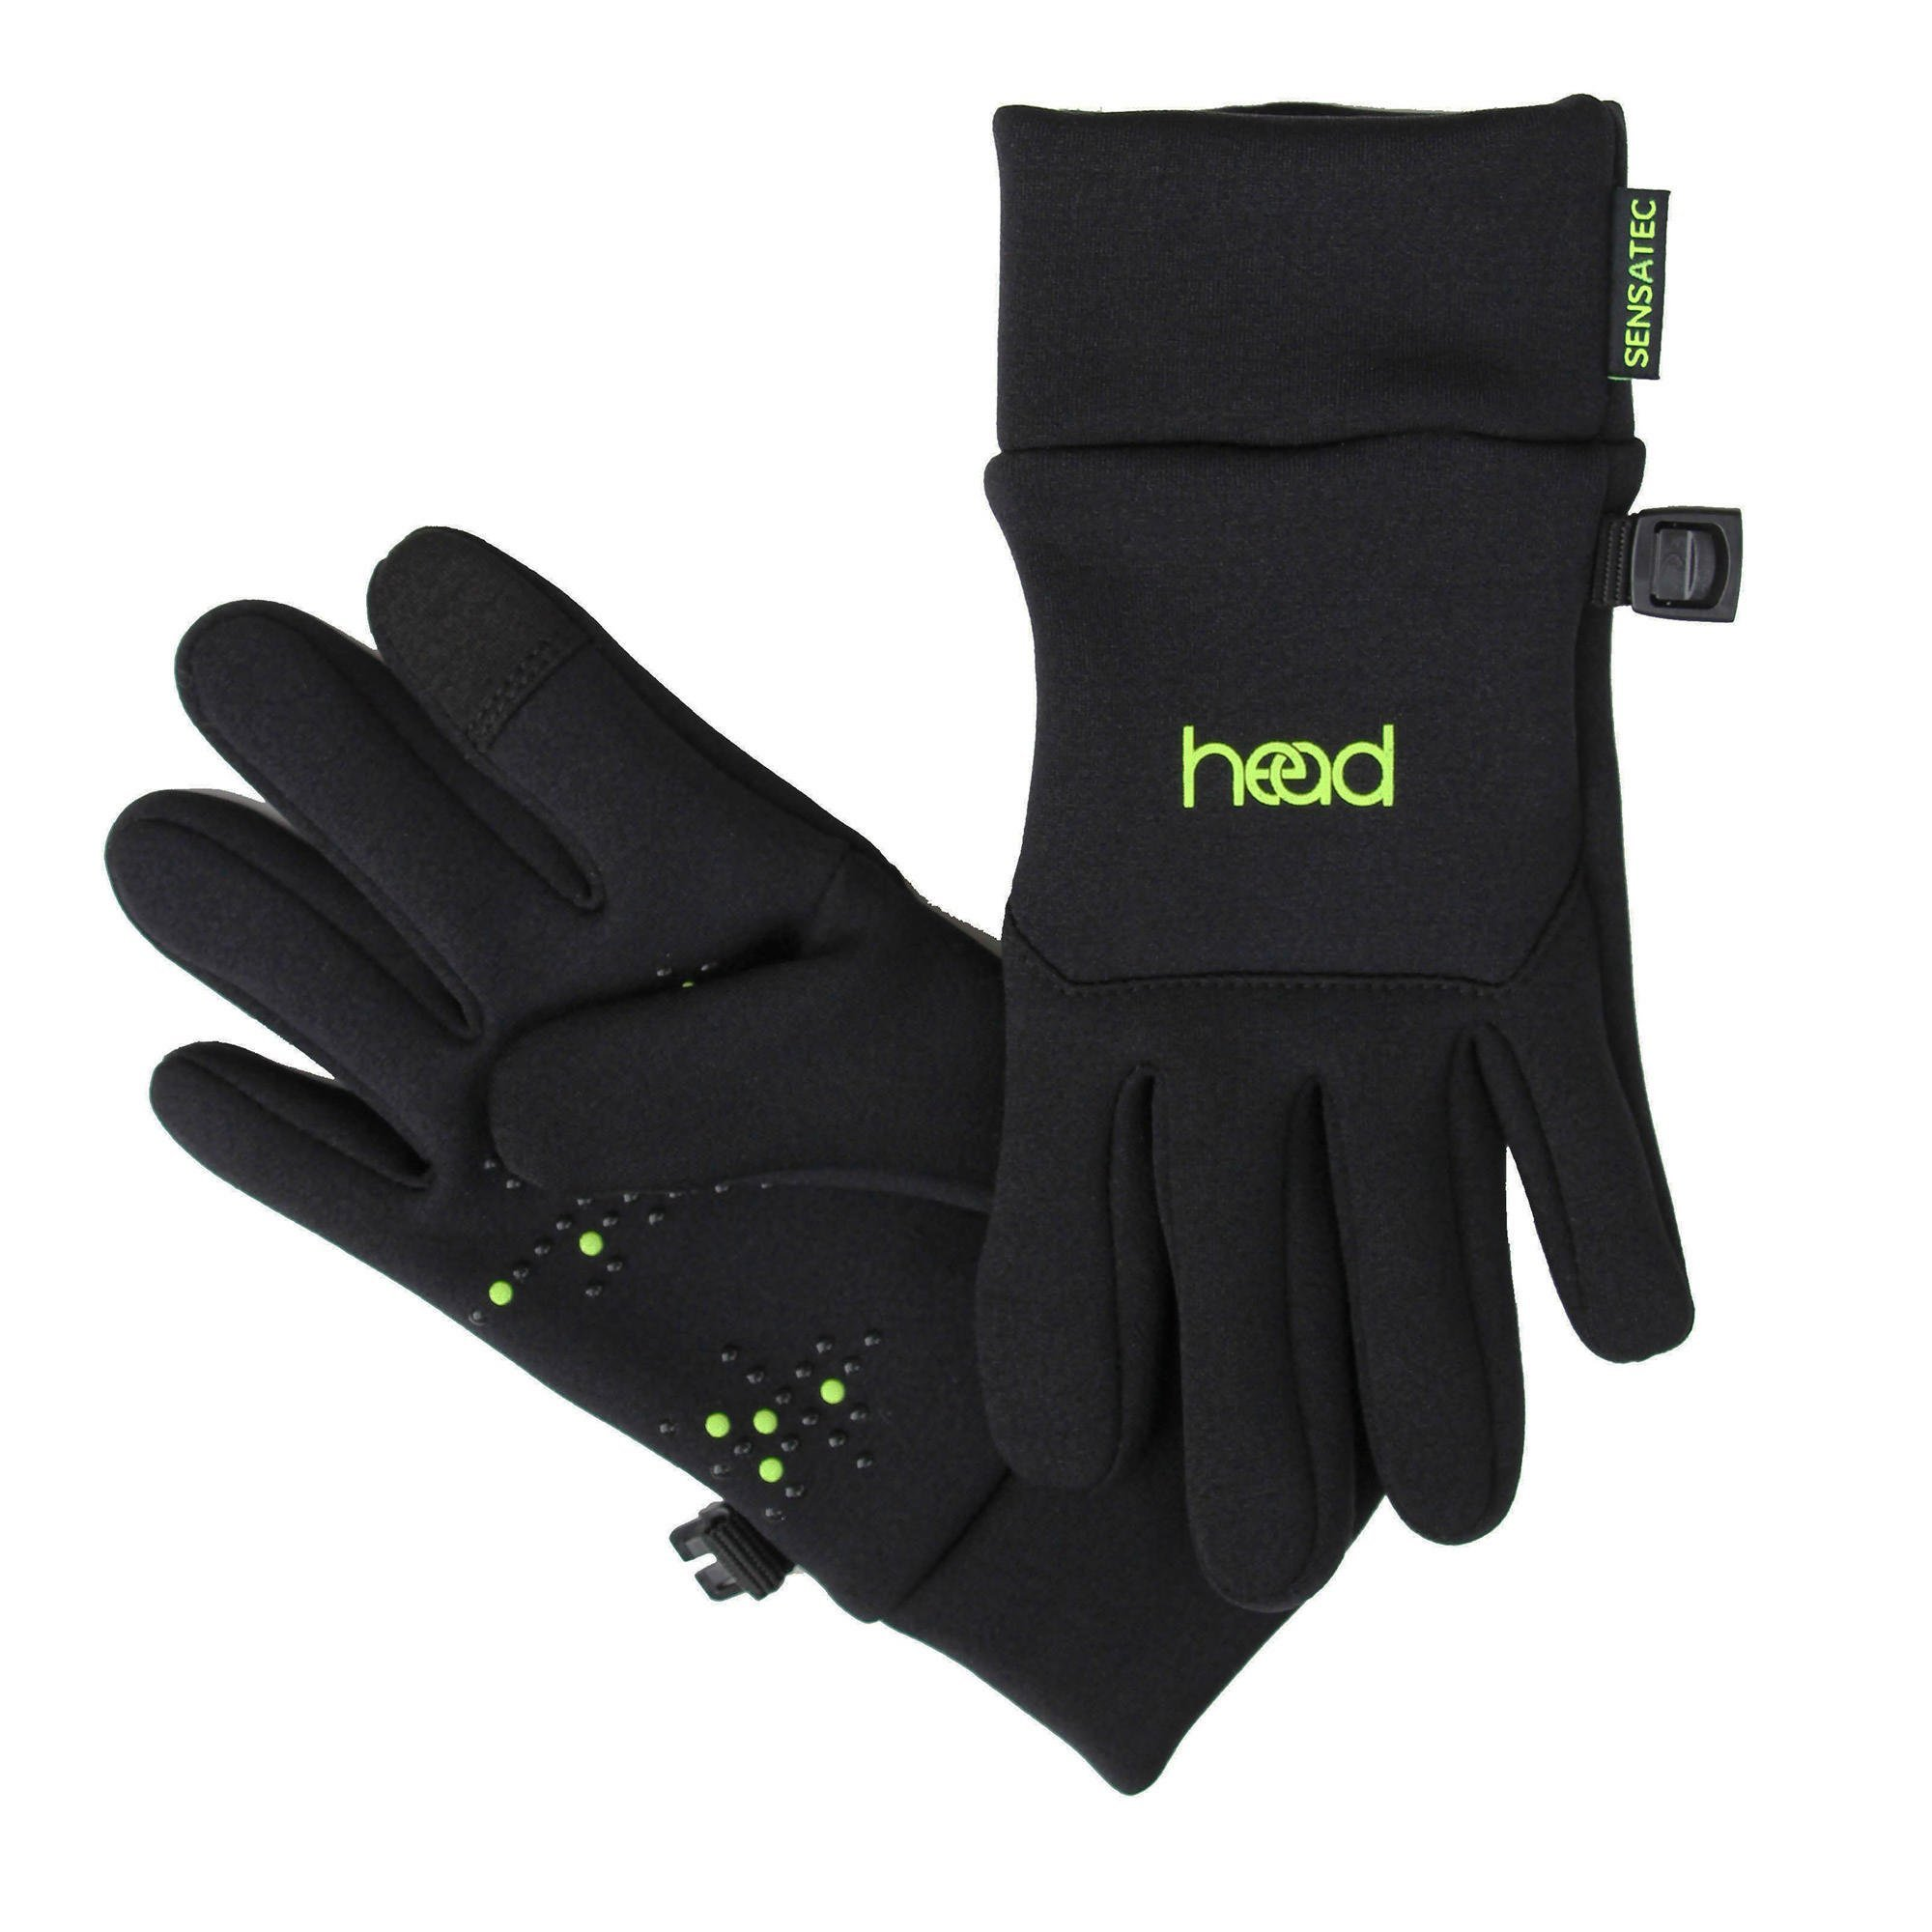 HEAD Kids Touchscreen Gloves - Black (SMALL)